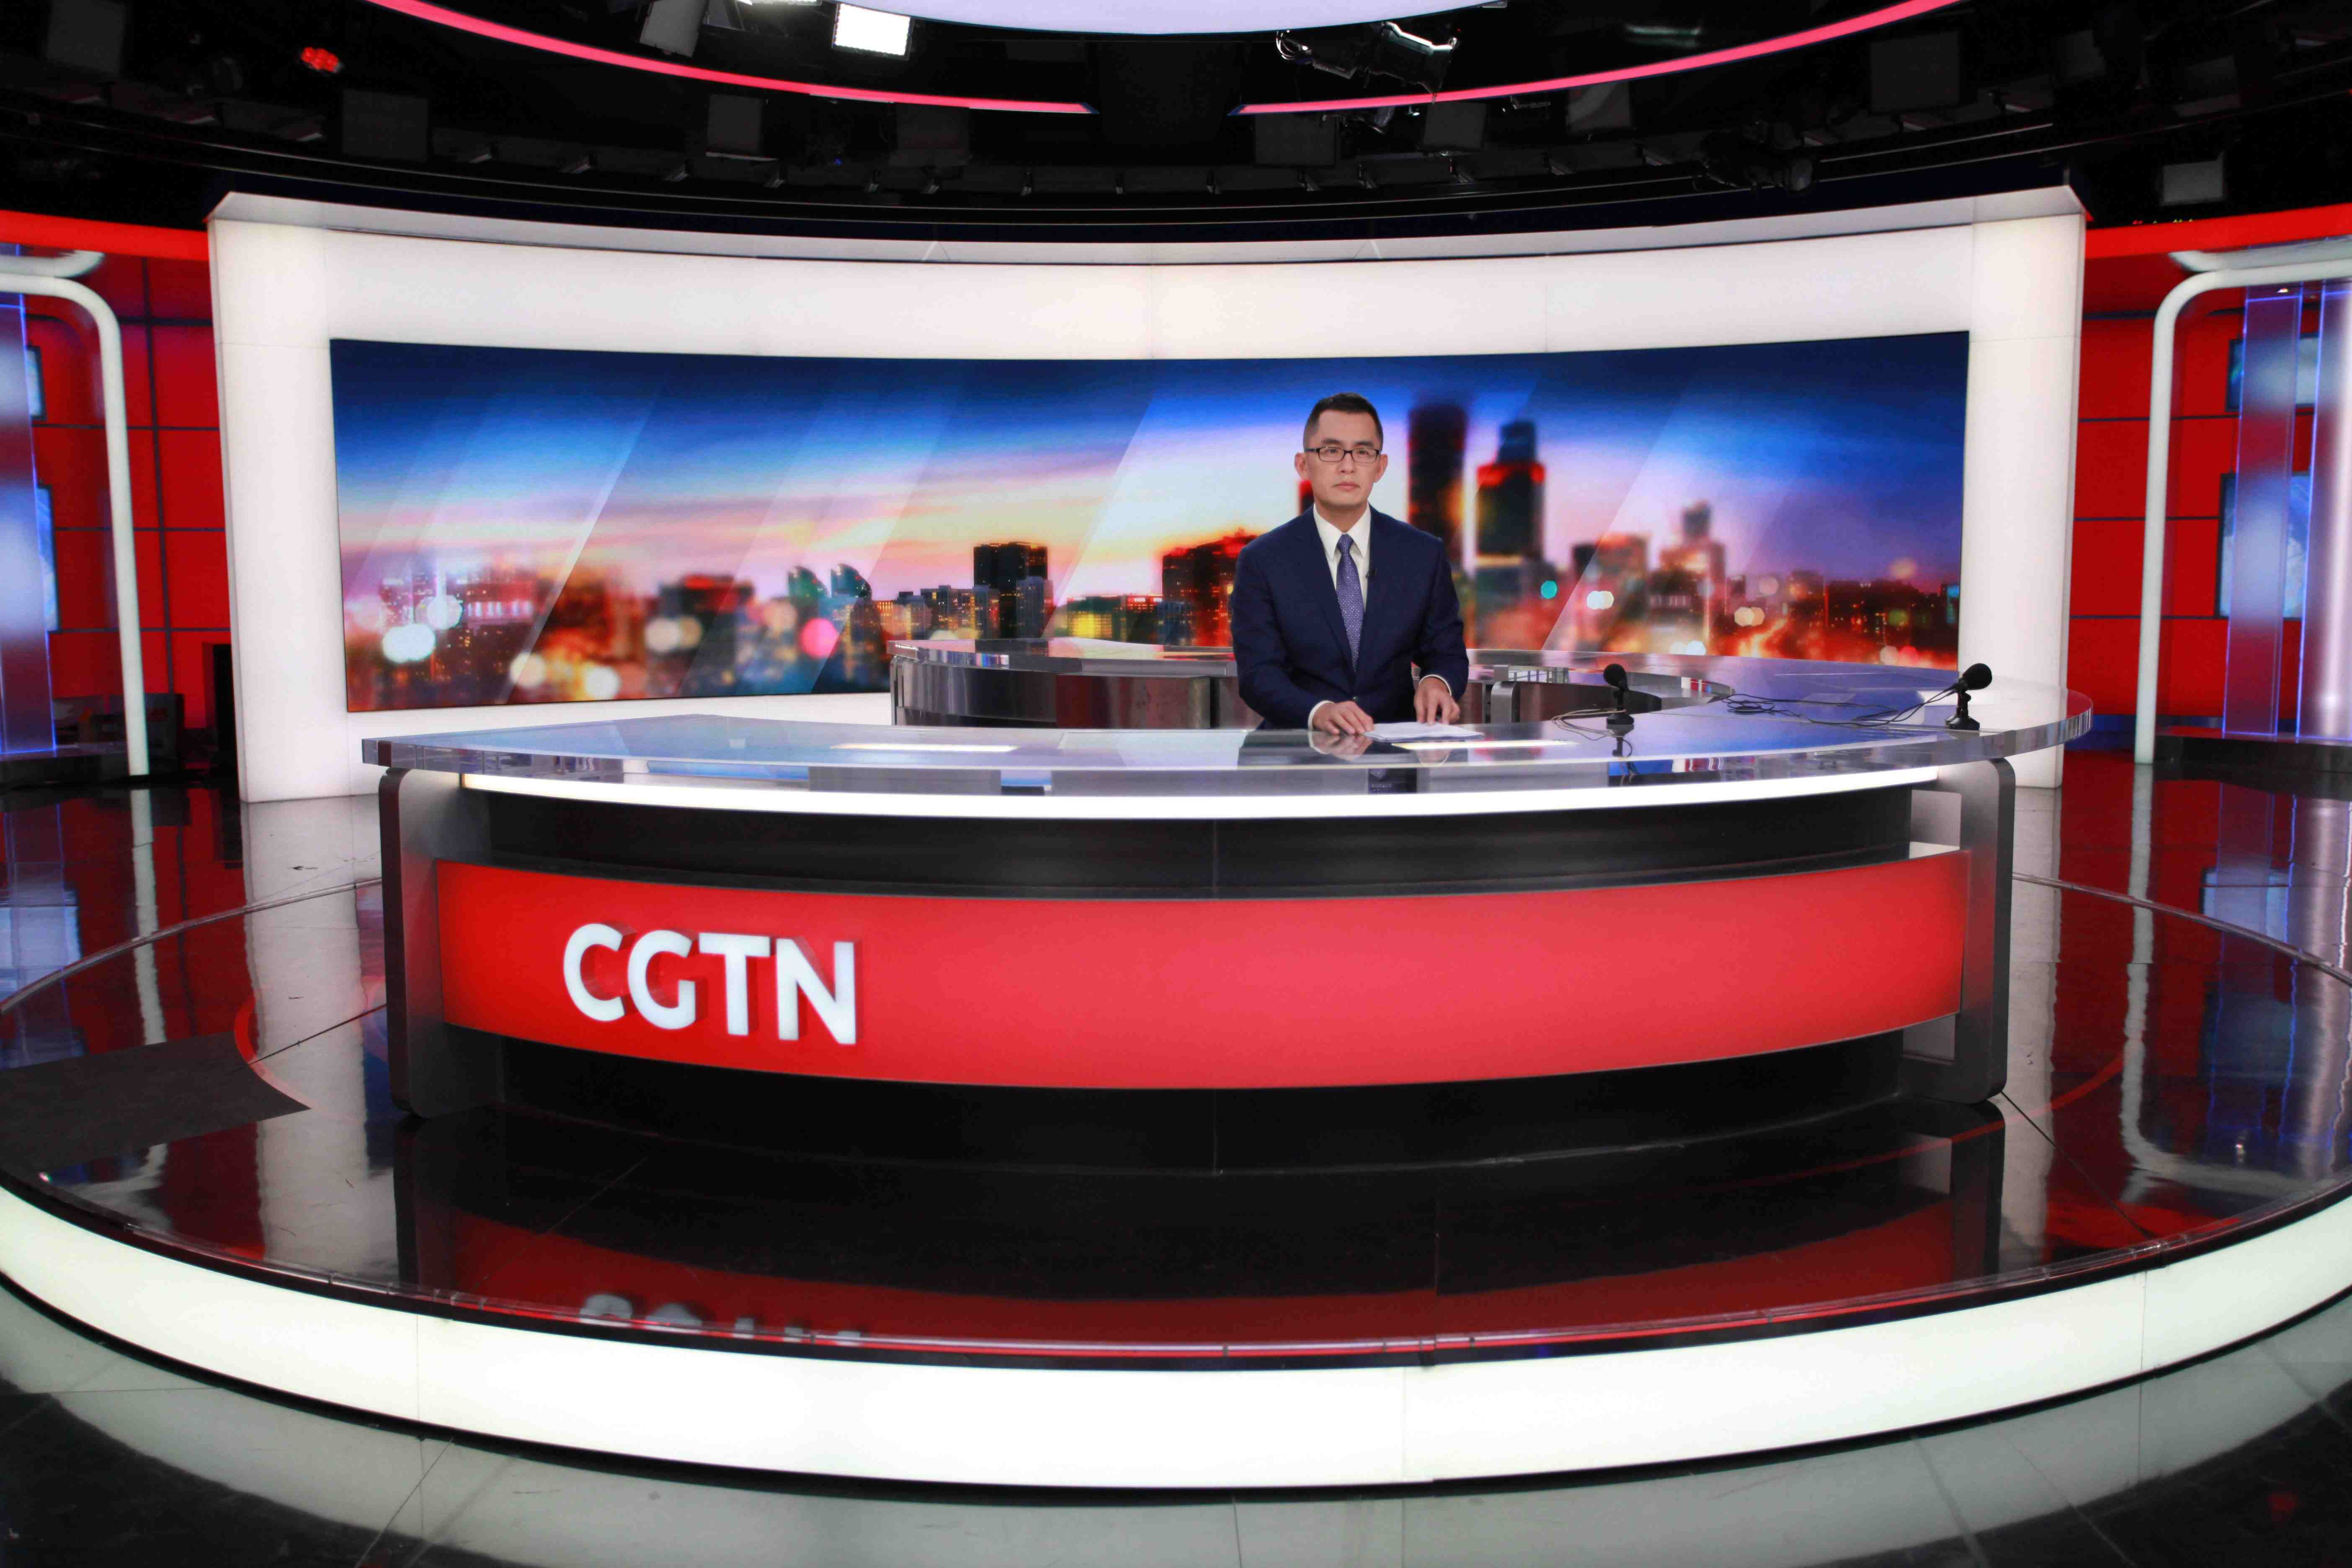 CCTV to launch CGTN - CGTN